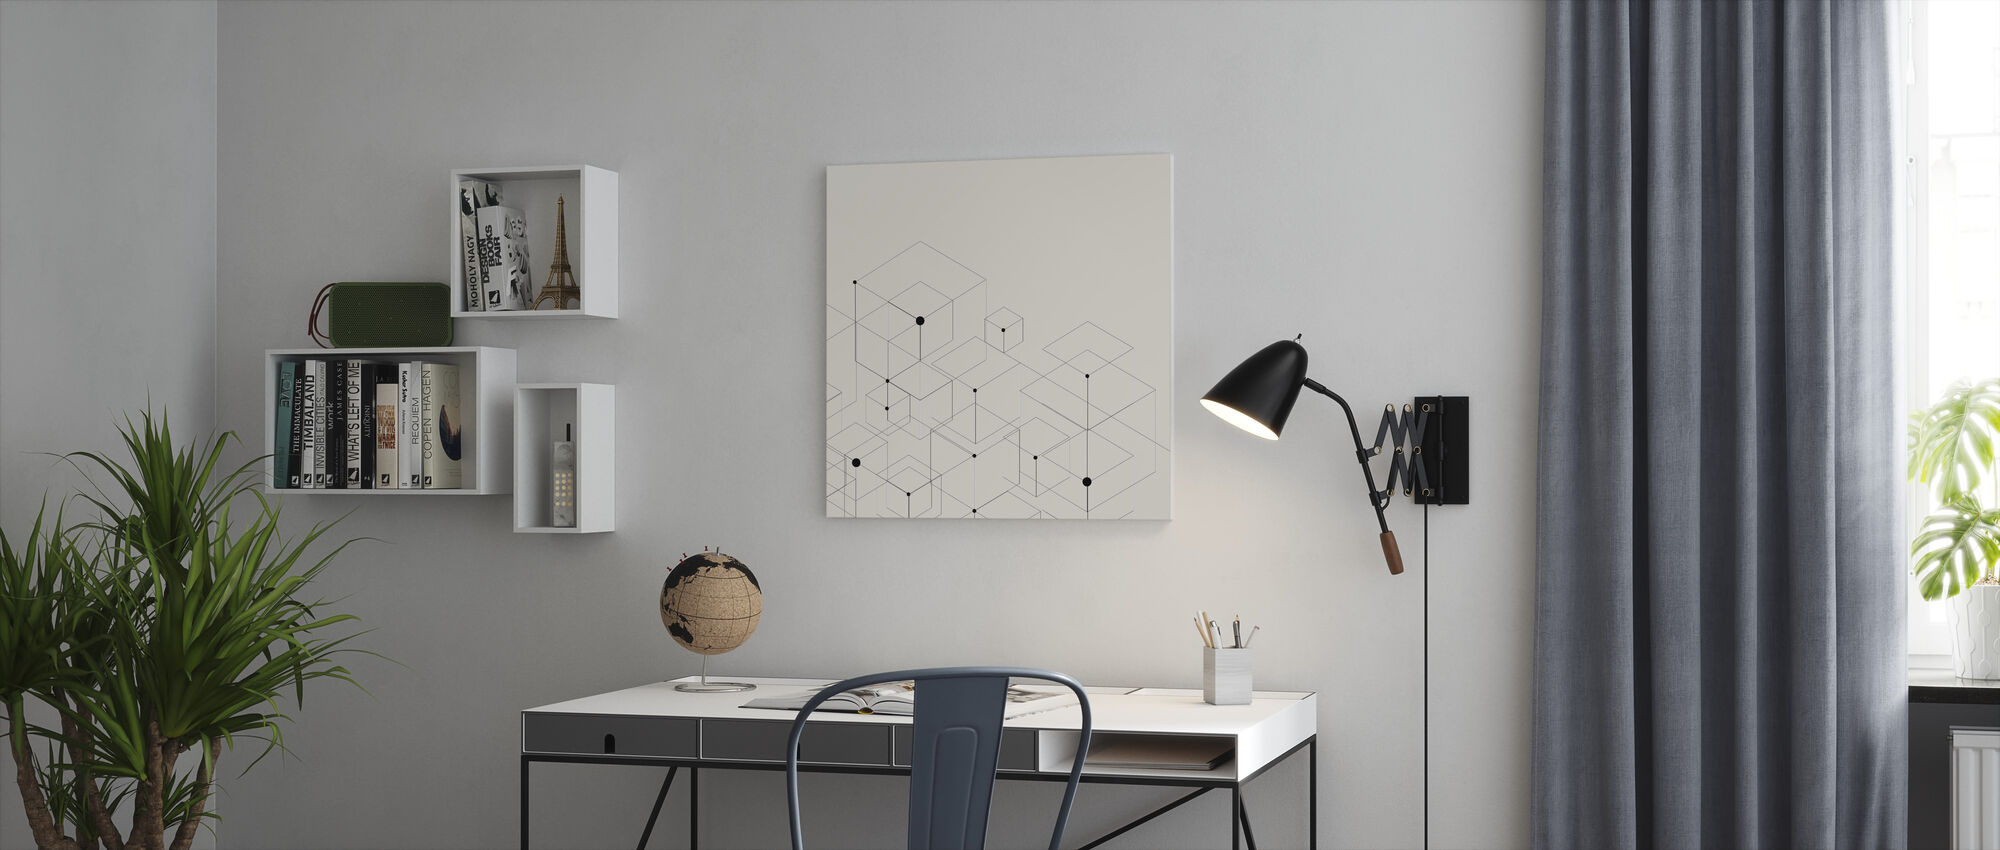 Black Lines - Canvas print - Office